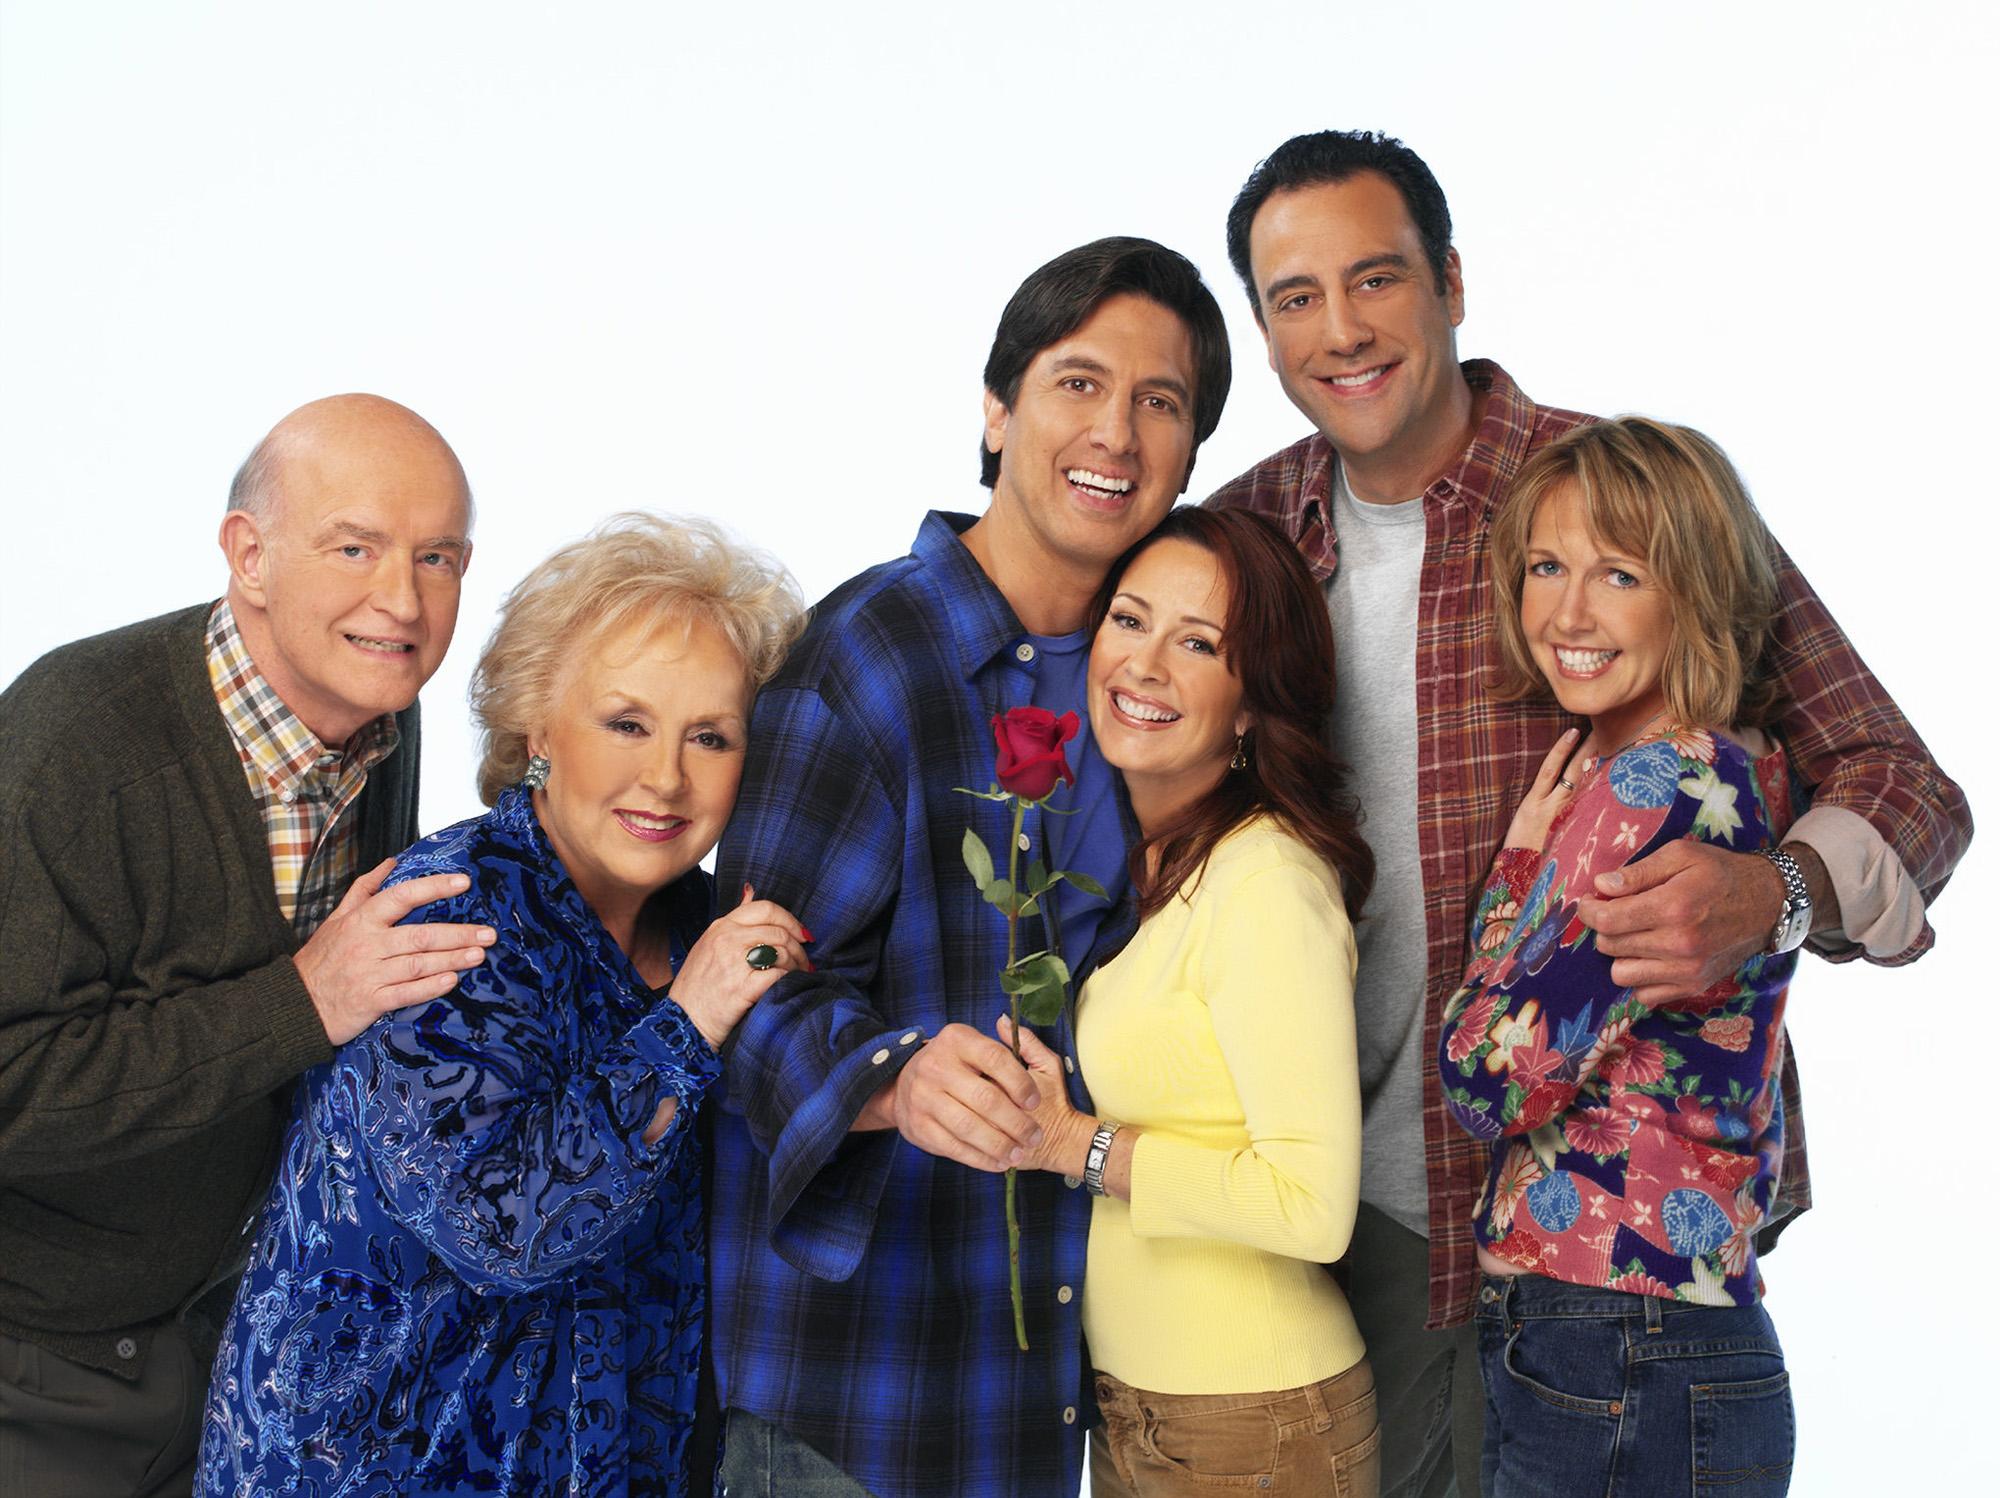 The cast of 'Everybody Loves Raymond' - Peter Boyle, Doris Roberts, Ray Romano, Patricia Heaton, Brad Garrett, and Monica Horan - poses for a photo.